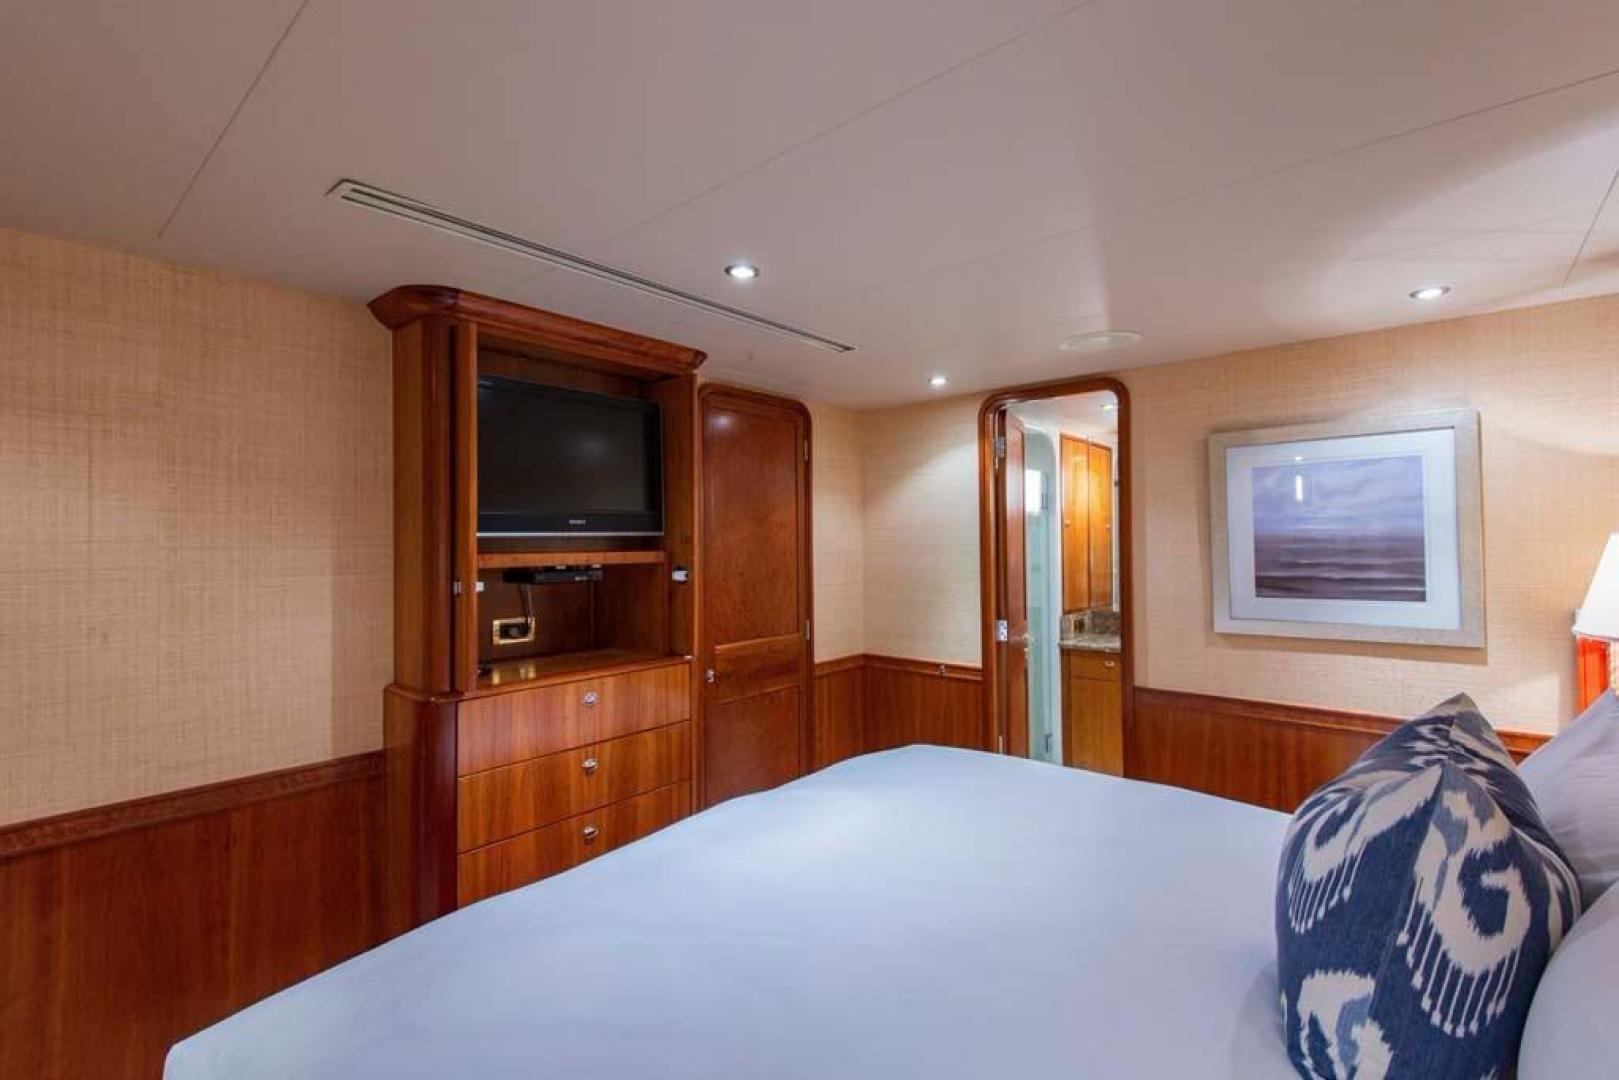 Westport-Tri-Deck 2003-Vision Jupiter-Florida-United States-VIP Port Guest Stateroom-370656 | Thumbnail